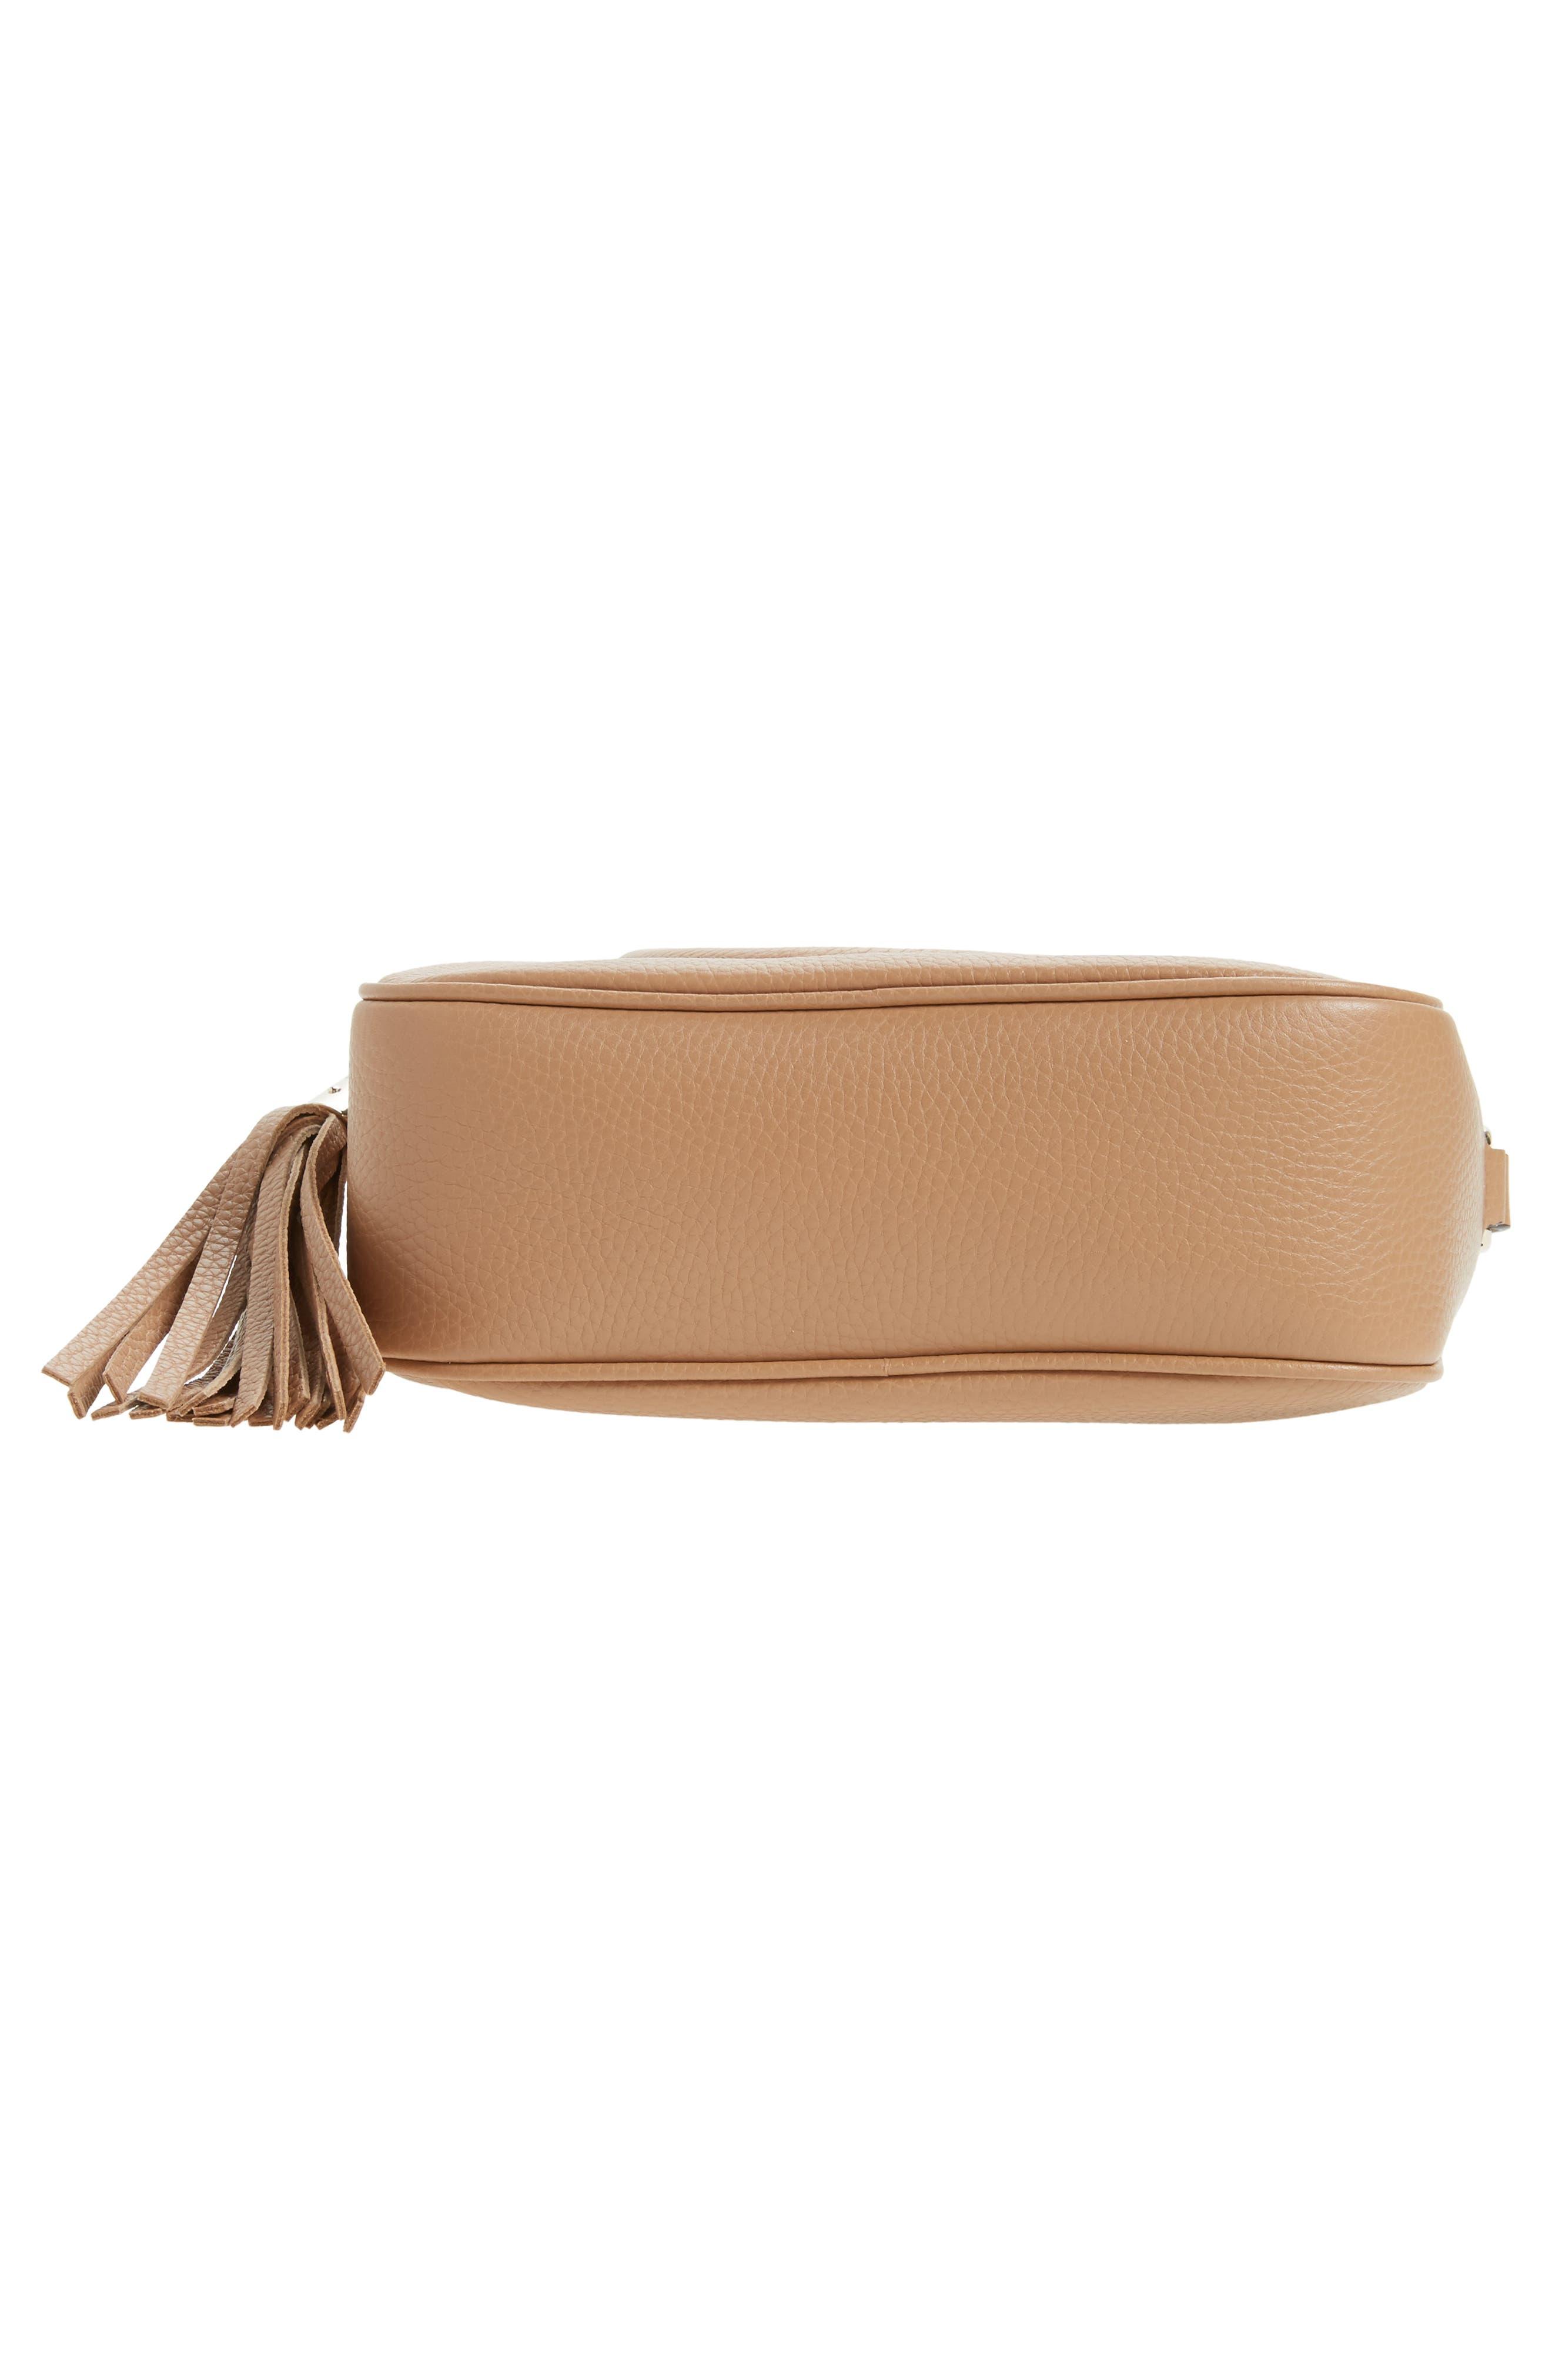 GUCCI, Soho Disco Leather Bag, Alternate thumbnail 6, color, 2754 CAMELIA